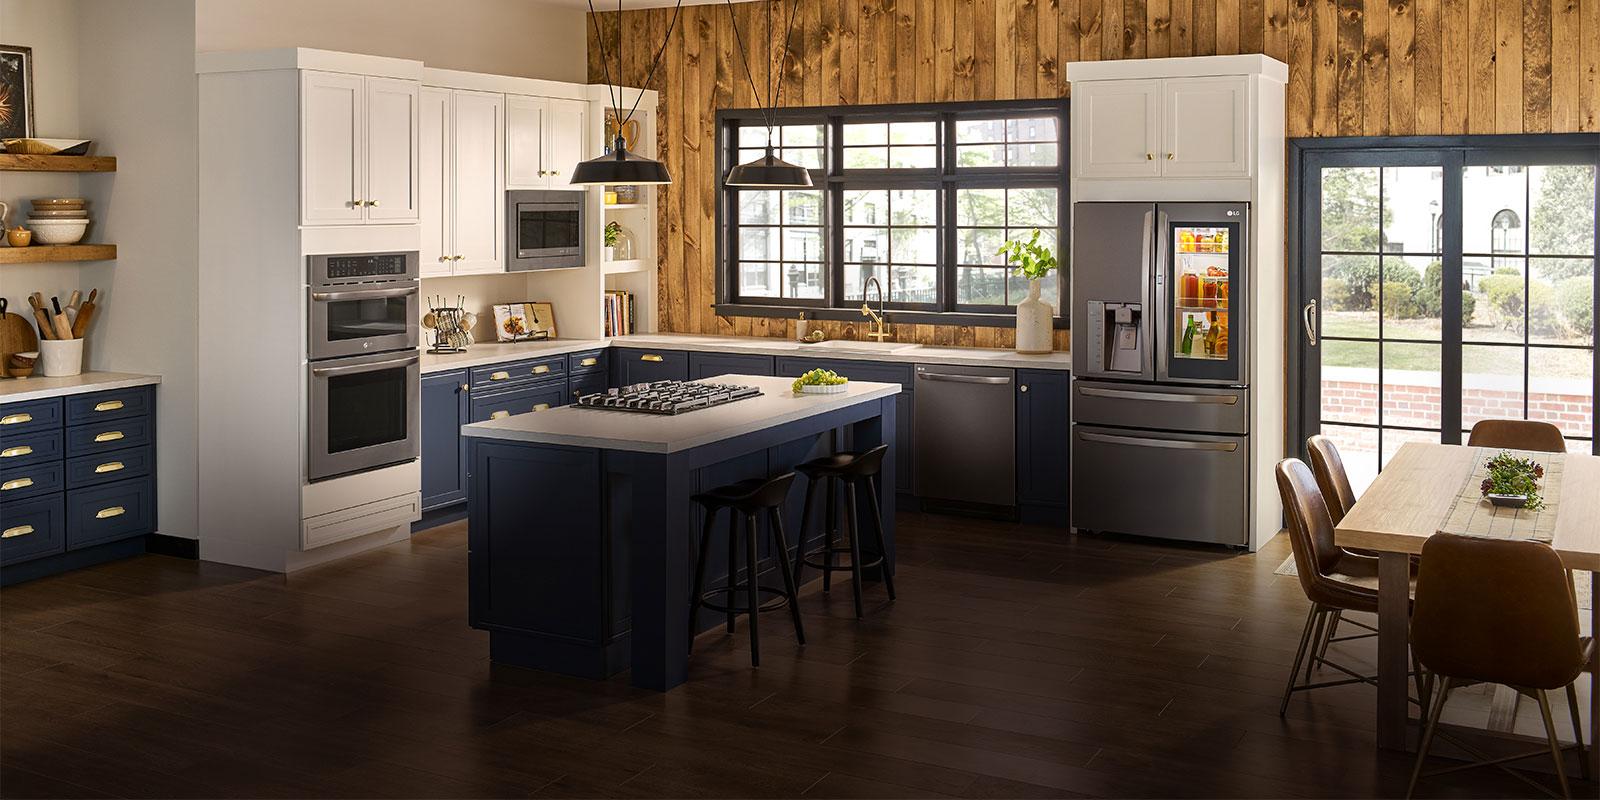 A fresh start in the kitchen image of a luxury kitchen